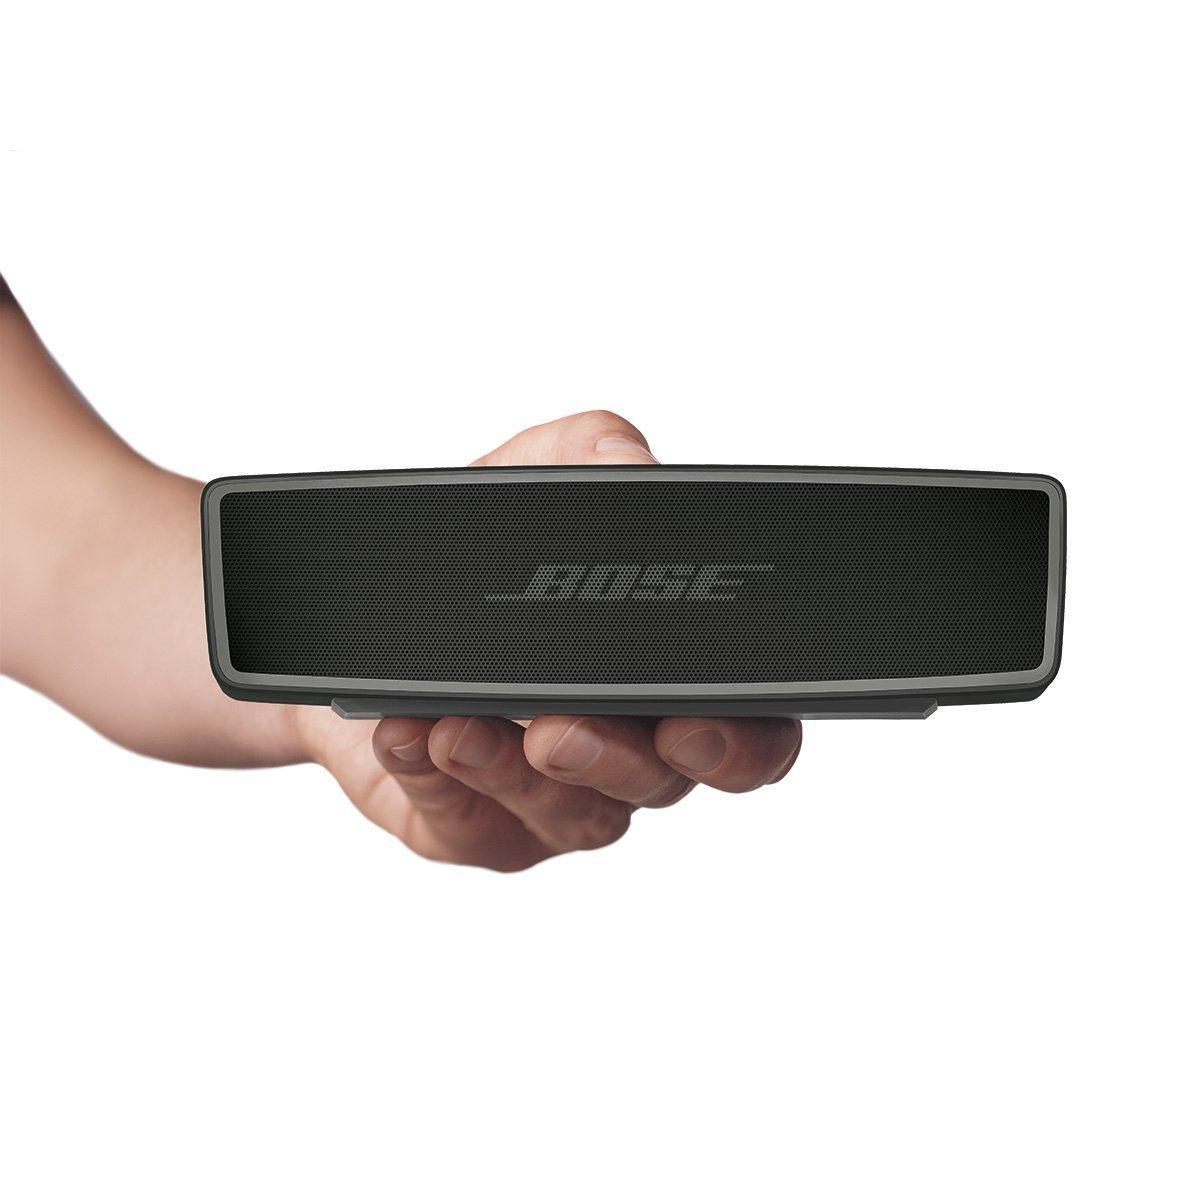 https://headphoniaks.com/wp-content/uploads/2015/11/Bose-SoundLink-Mini-II-Altavoz-Bluetooth-portatil-3.jpg